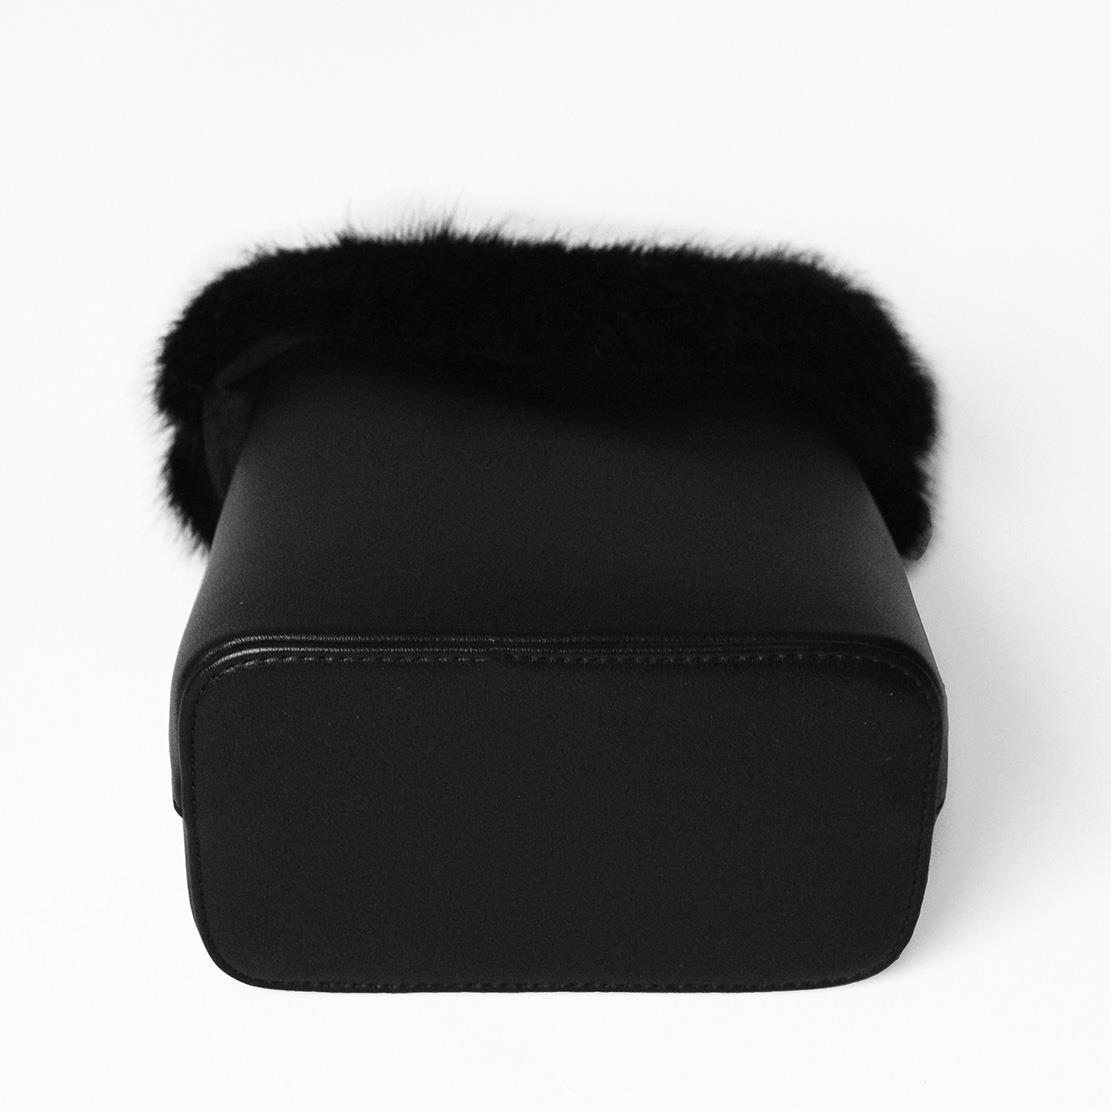 6b4e53df8f55 Молодежная черная сумка с мехом для девушки: 999 грн. - Сумки ...